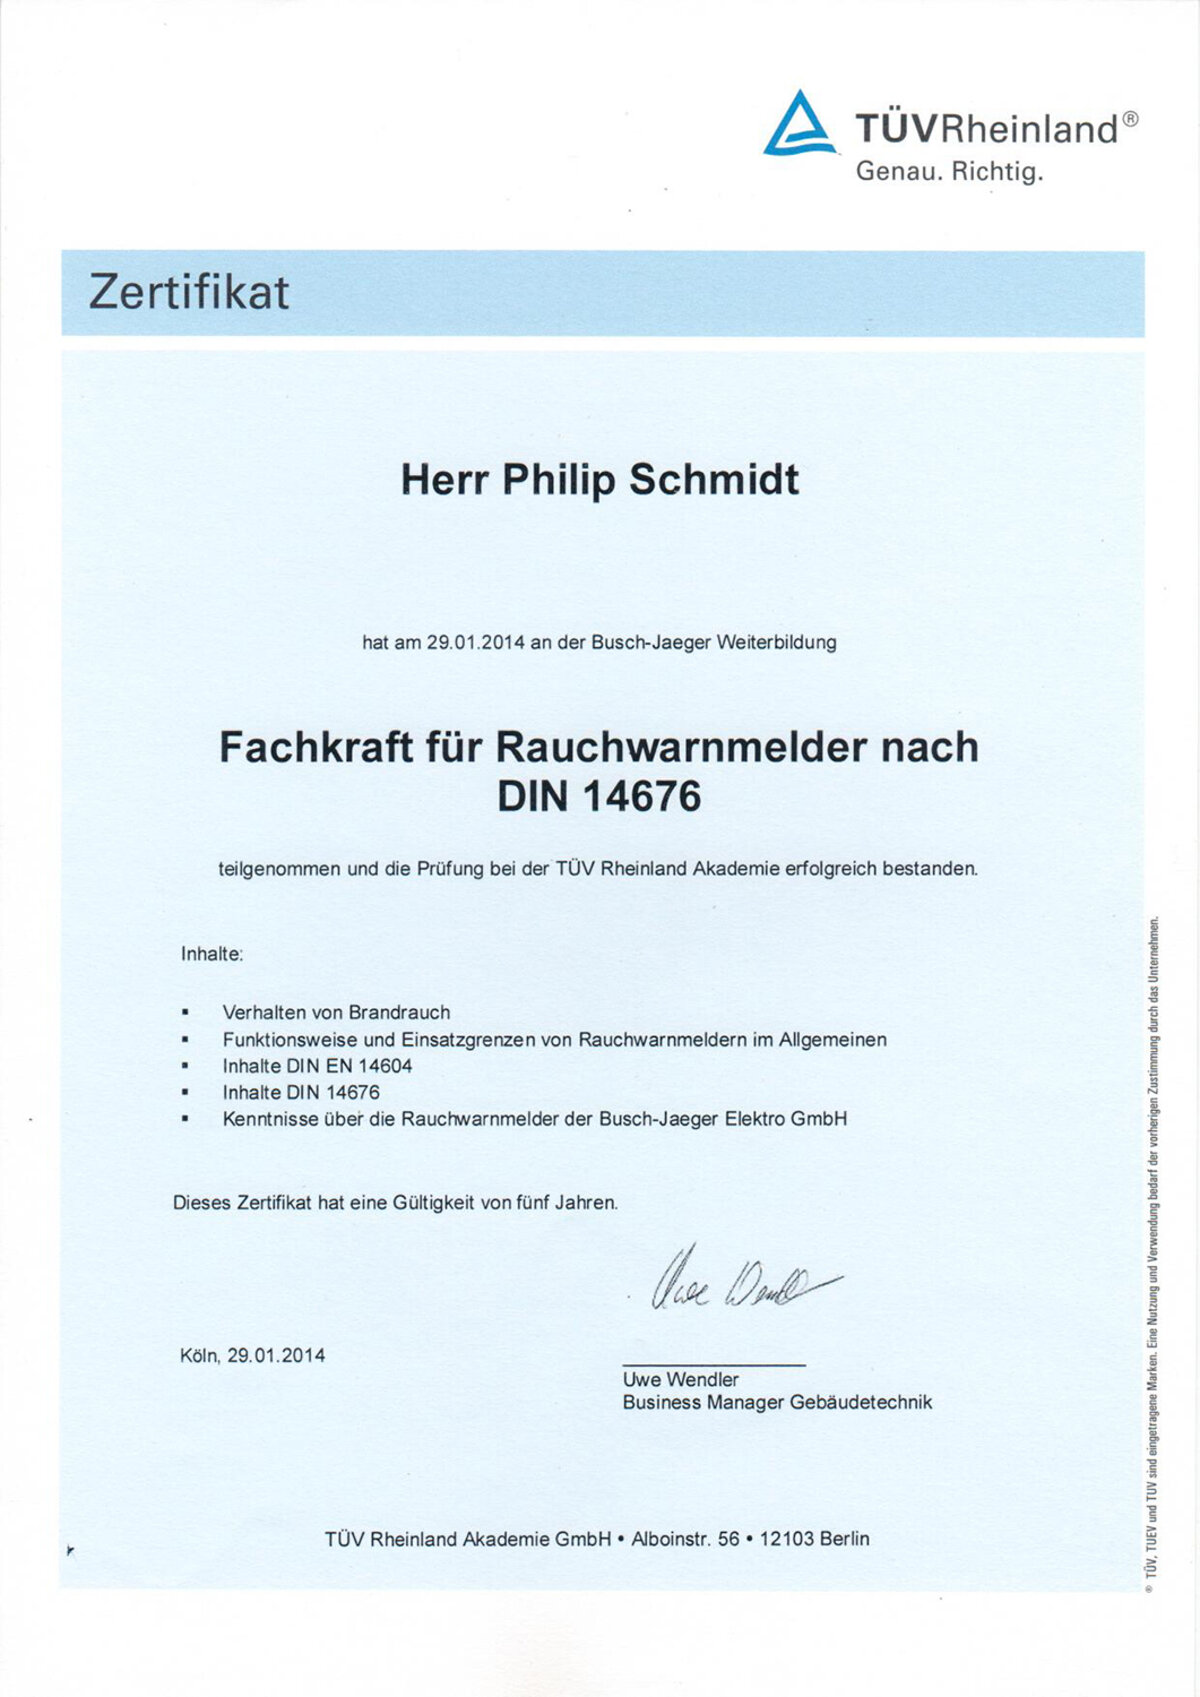 hemmelmann elektrotechnik gmbh e masters m lheim an der ruhr zertifikate. Black Bedroom Furniture Sets. Home Design Ideas